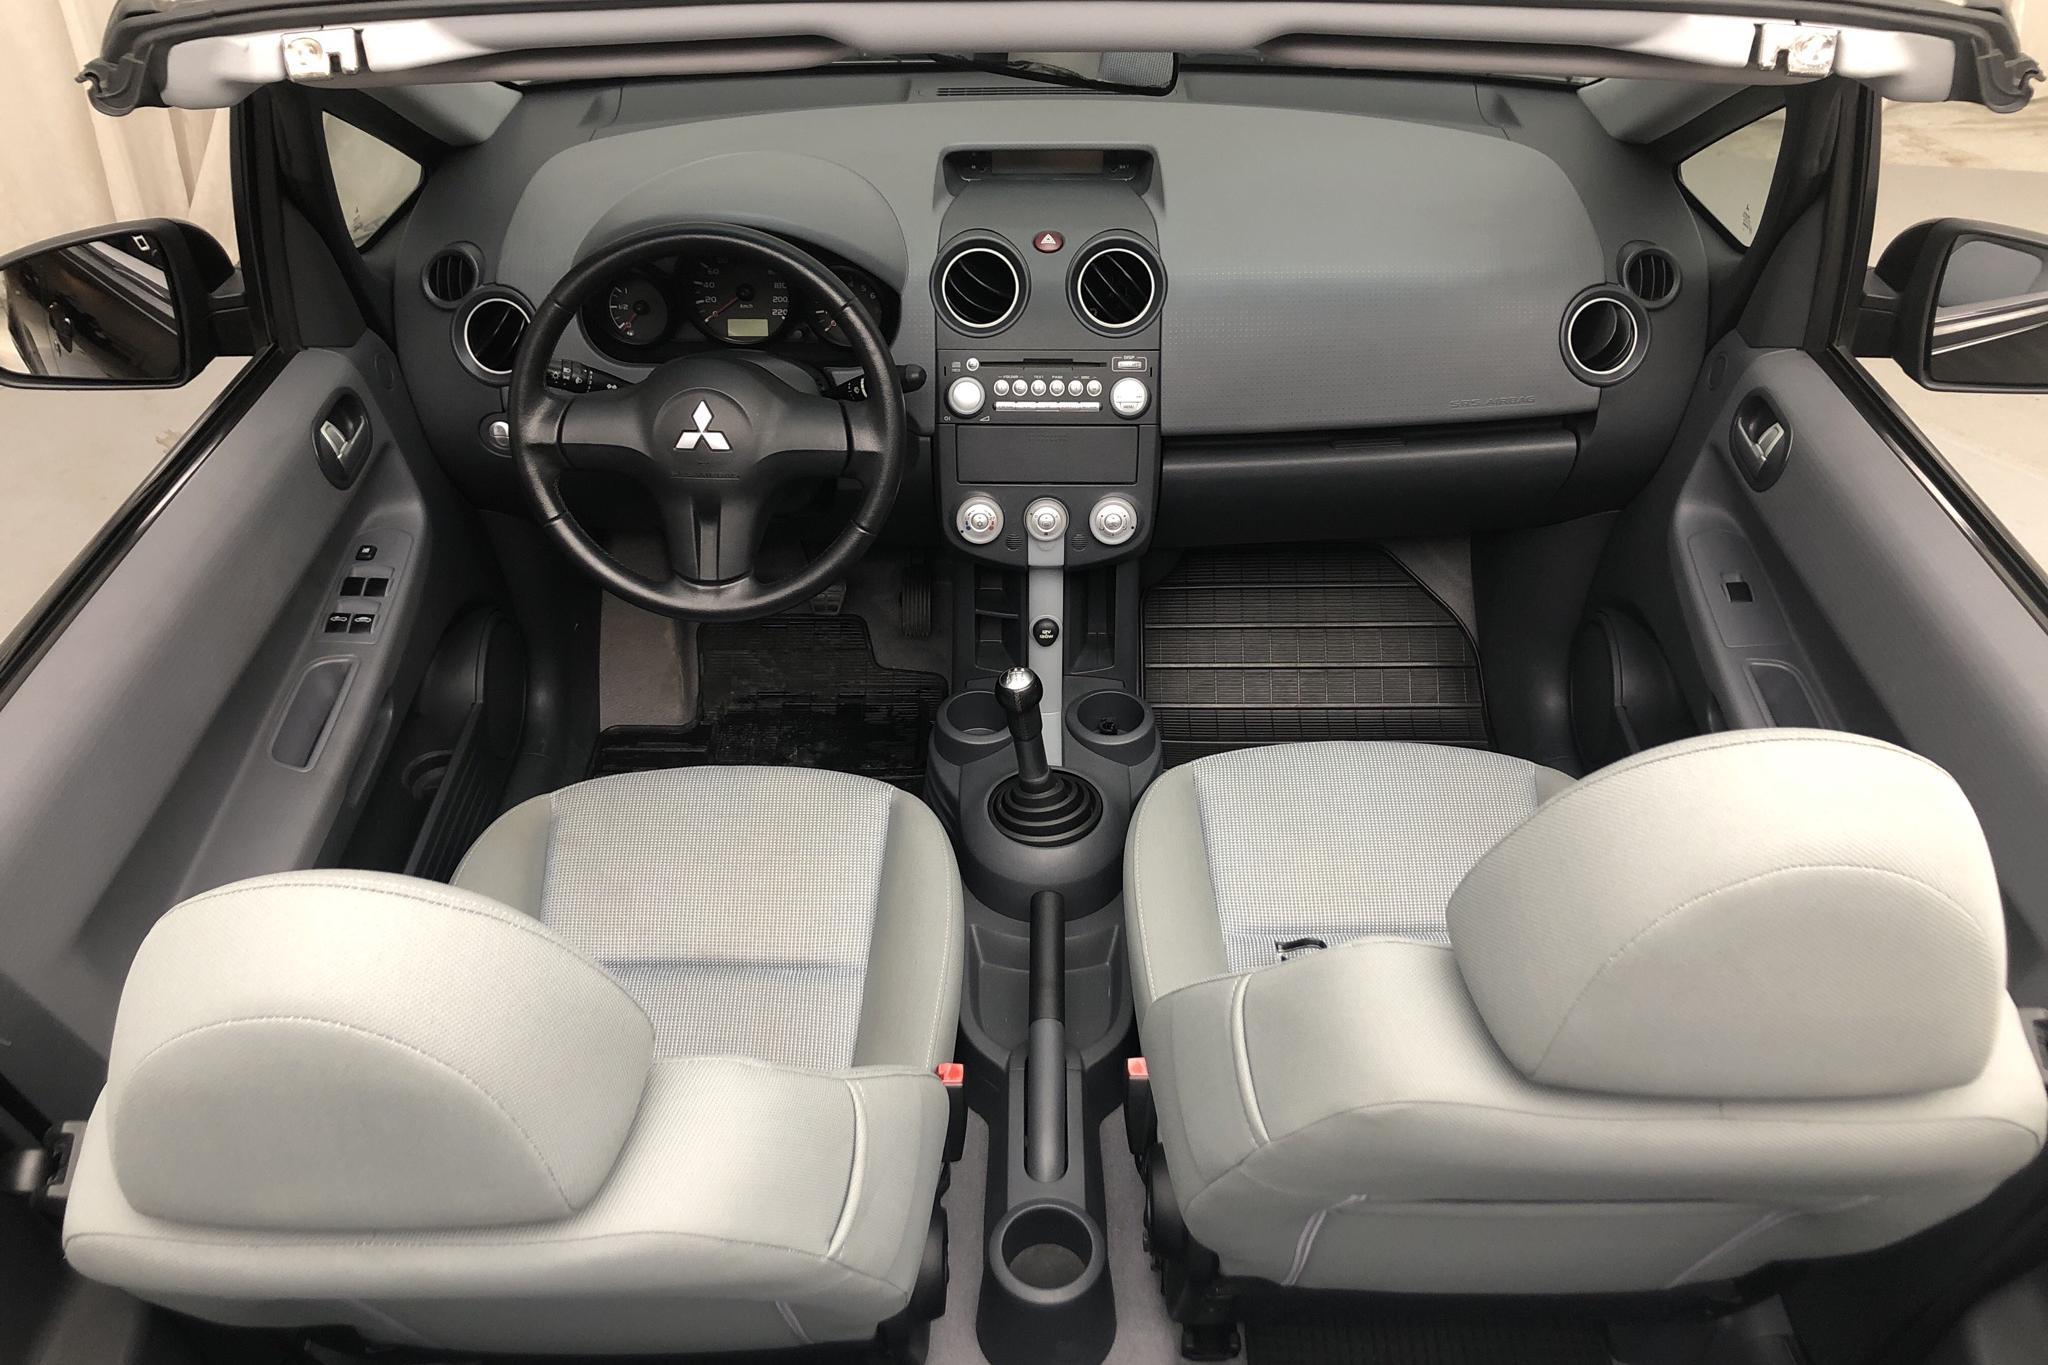 Mitsubishi Colt 1.5 Cabriolet (109hk) - 65 660 km - Manual - black - 2007